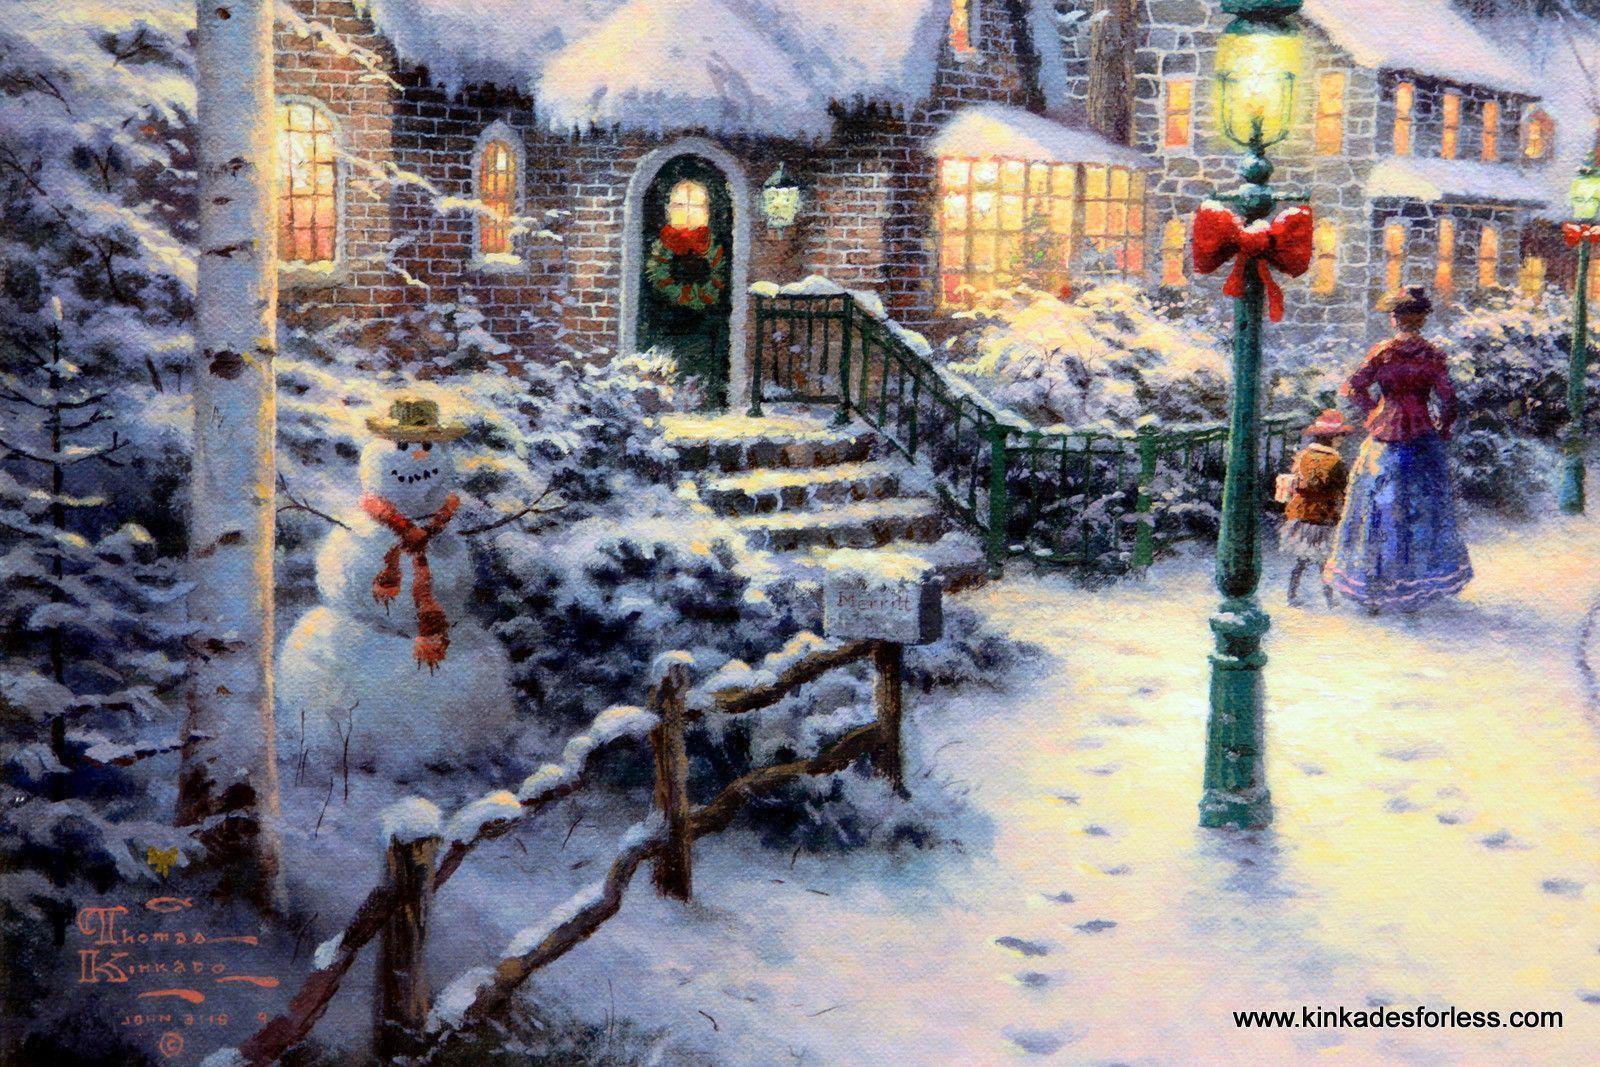 Pictures of Thomas Kinkade Christmas Wallpaper - www.kidskunst.info